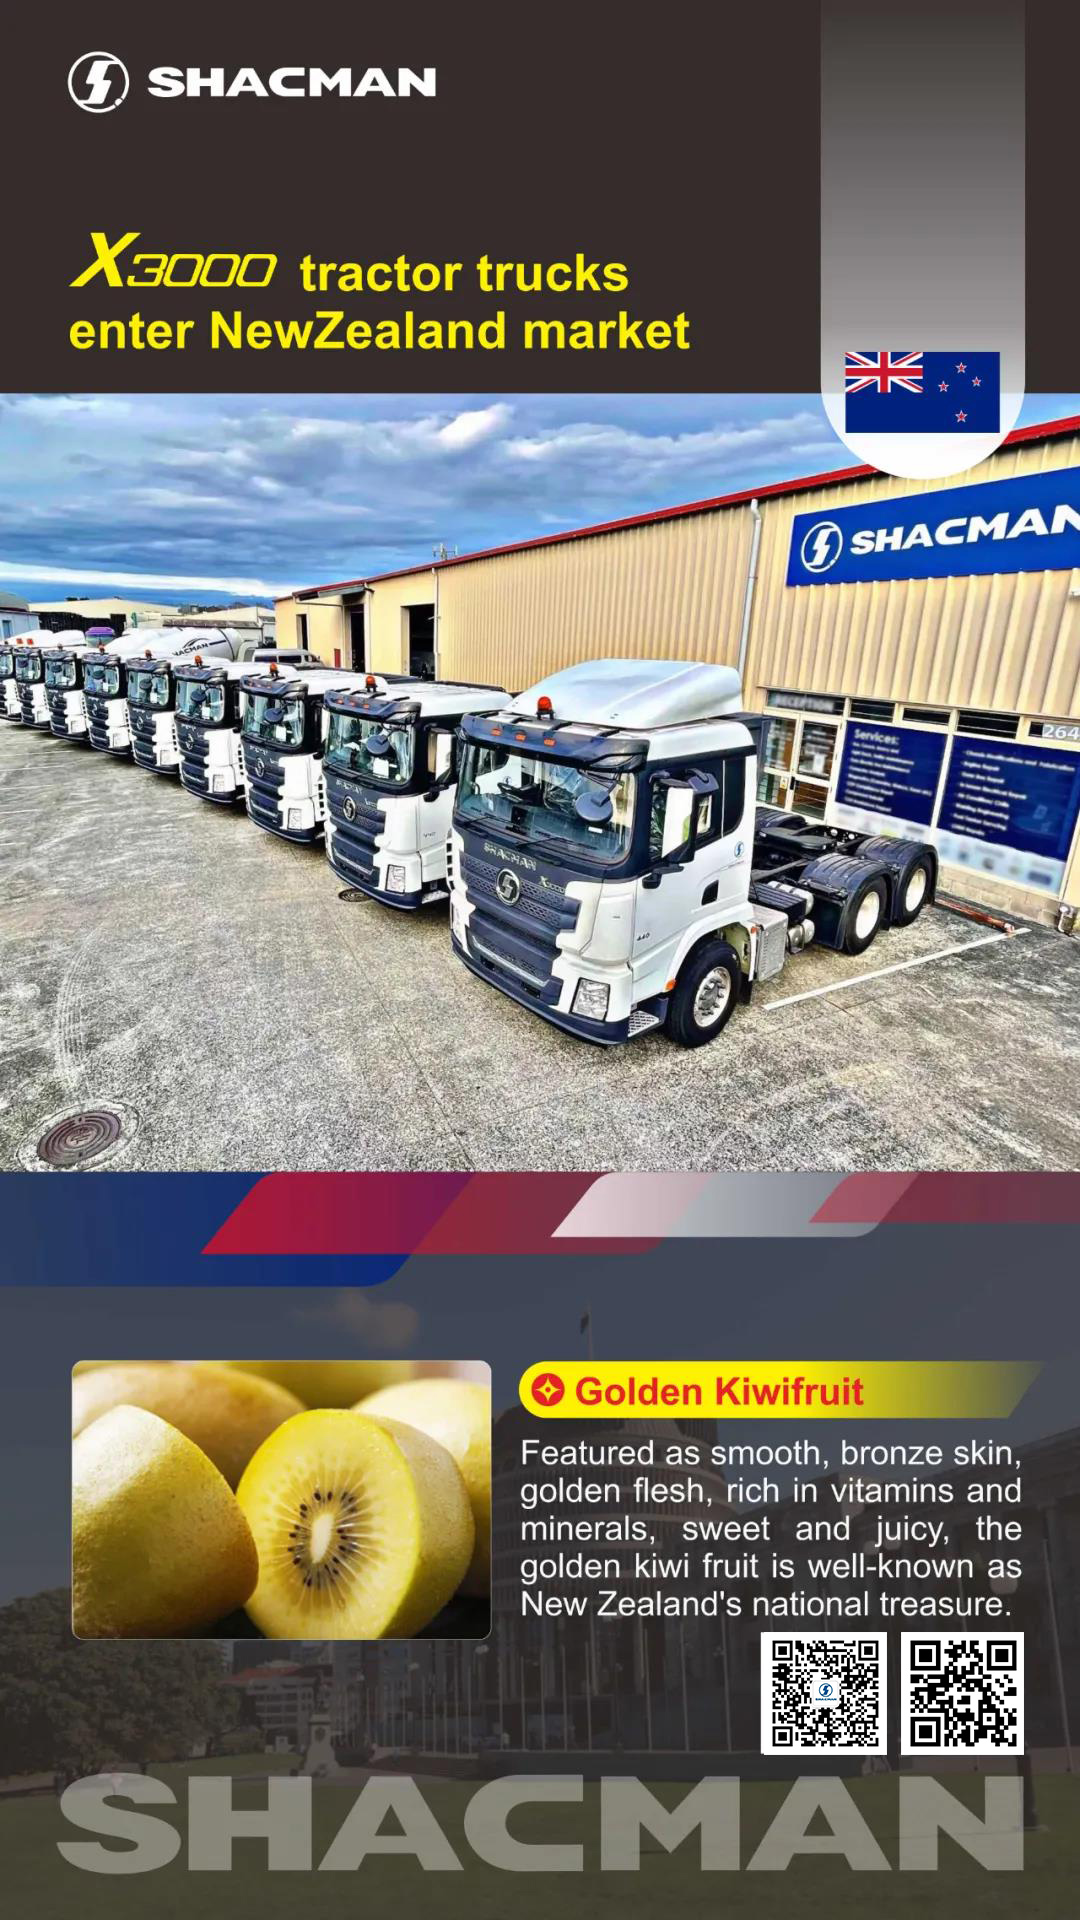 SHACMAN X3000 Tractors enter into New Zealand market